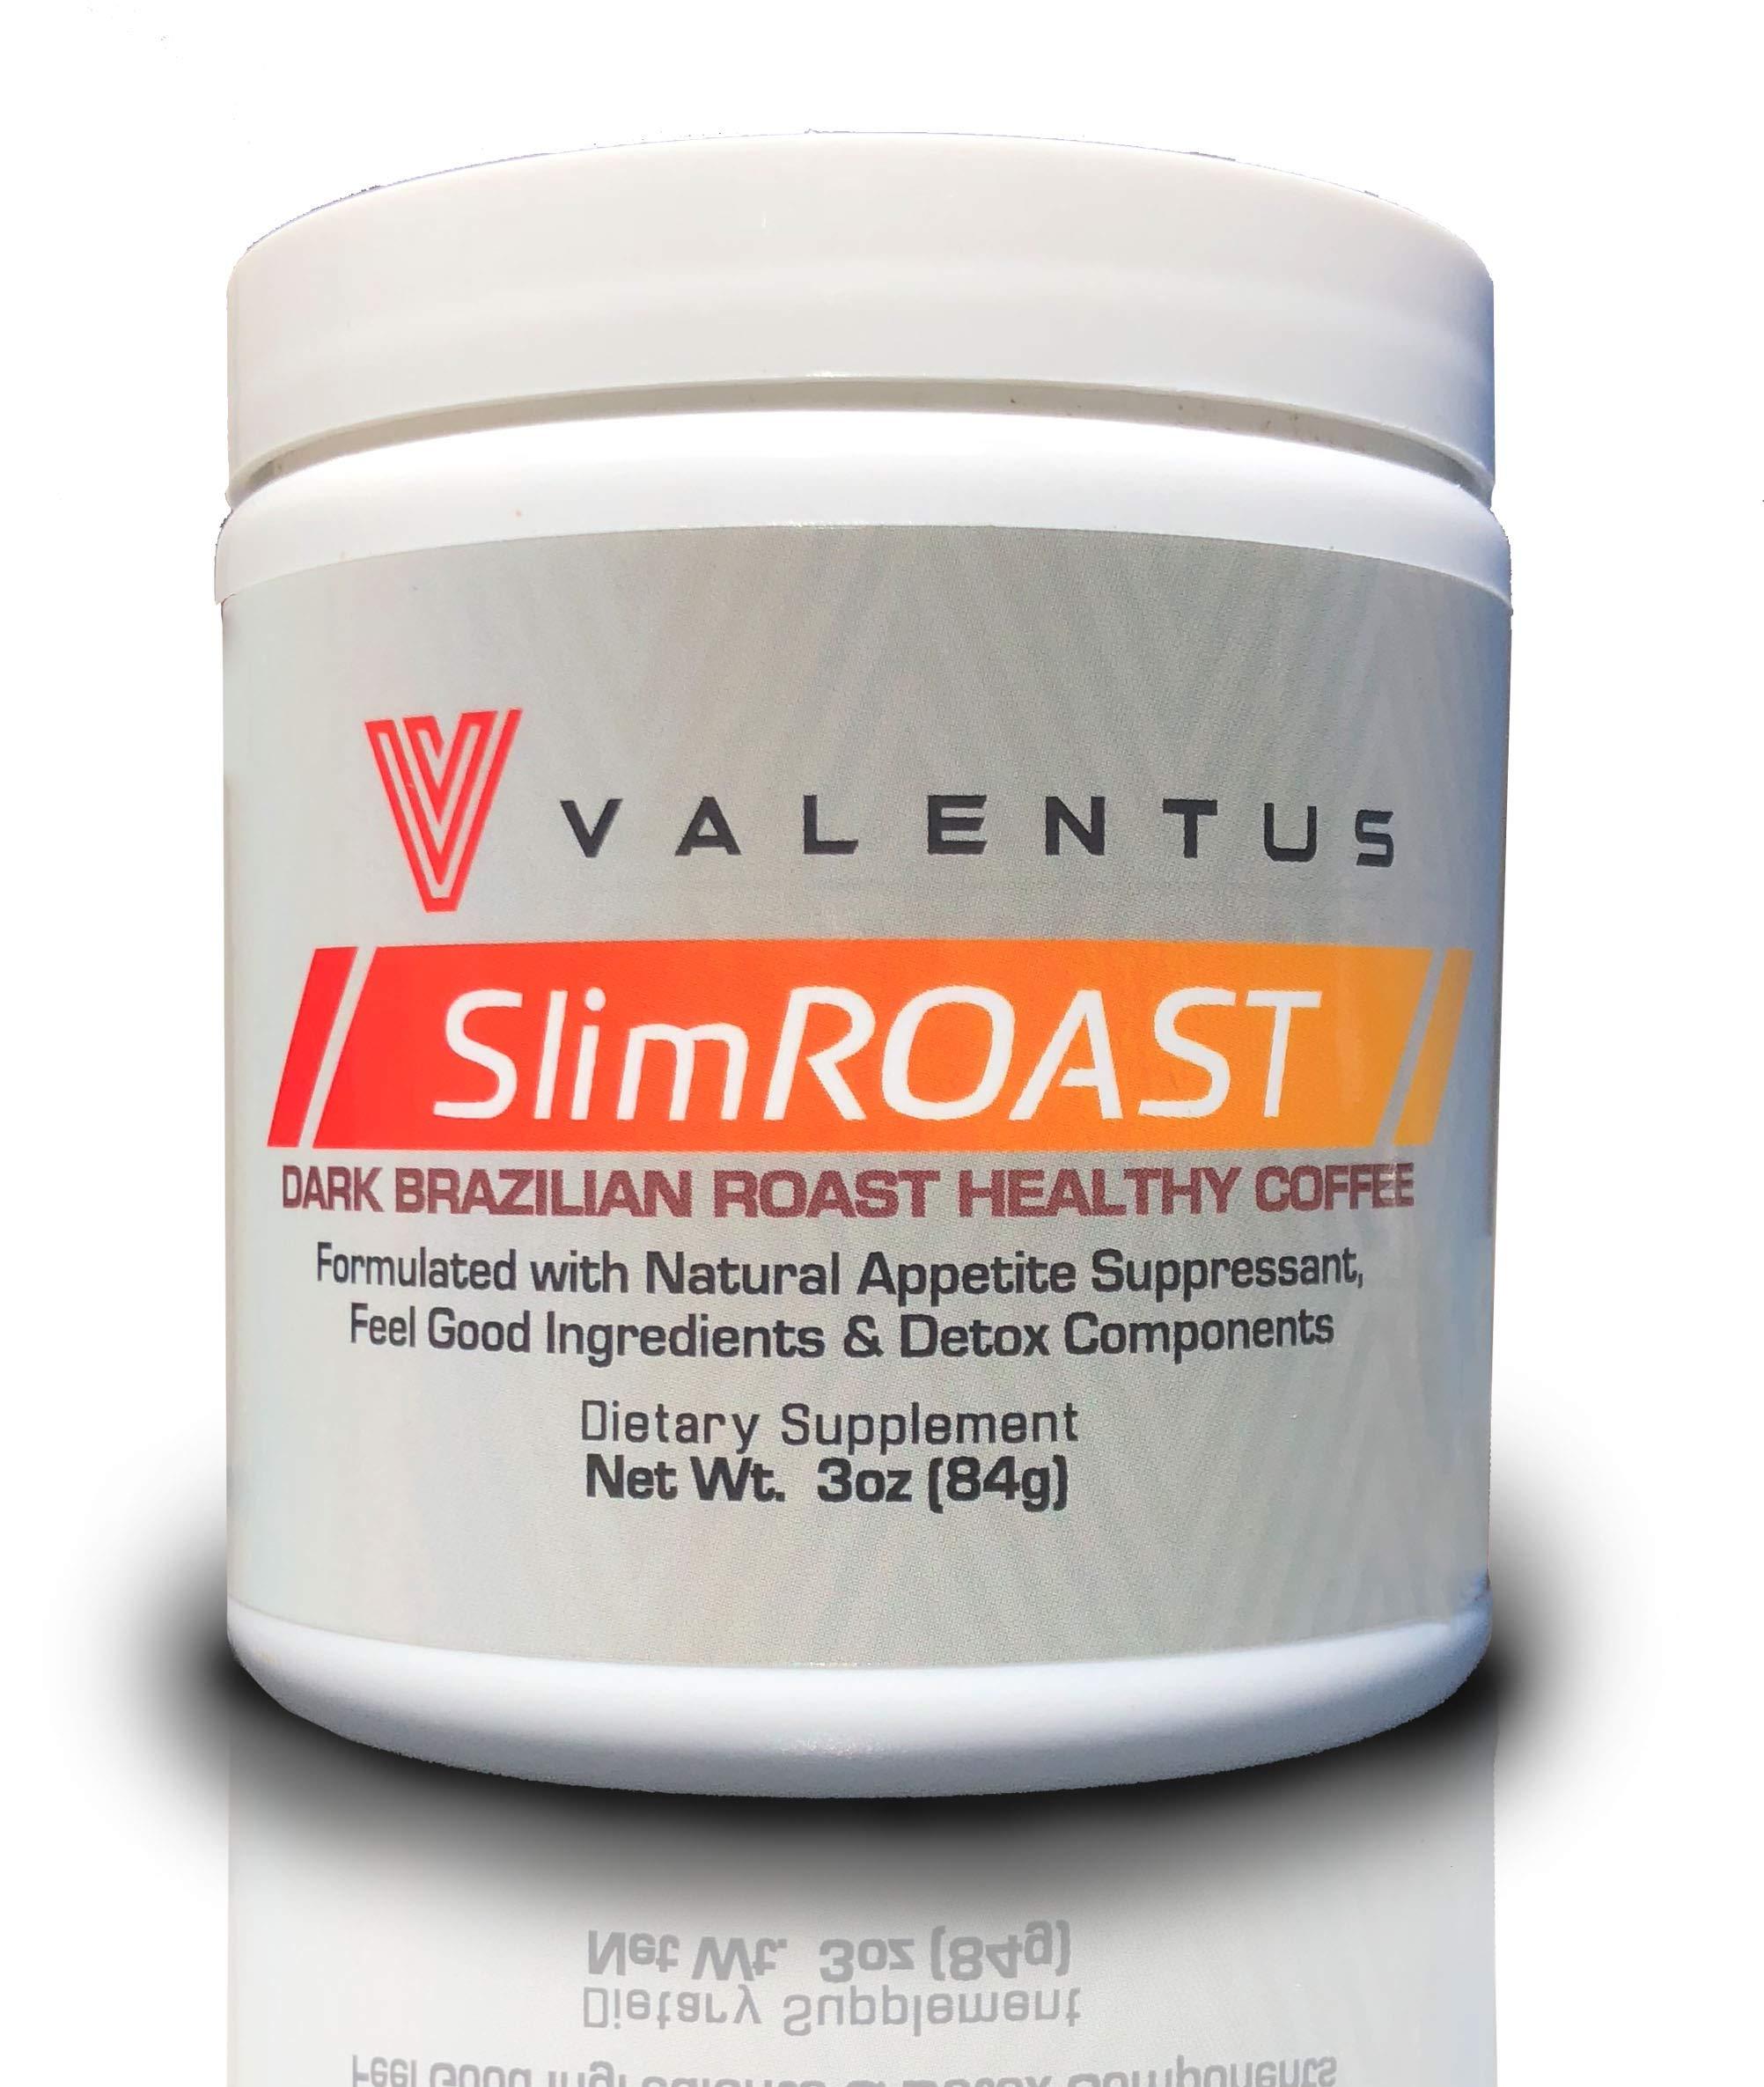 Valentus Brazilian Slim Roast Coffee - Dark Roast 3 Oz. Canister (24 Servings)